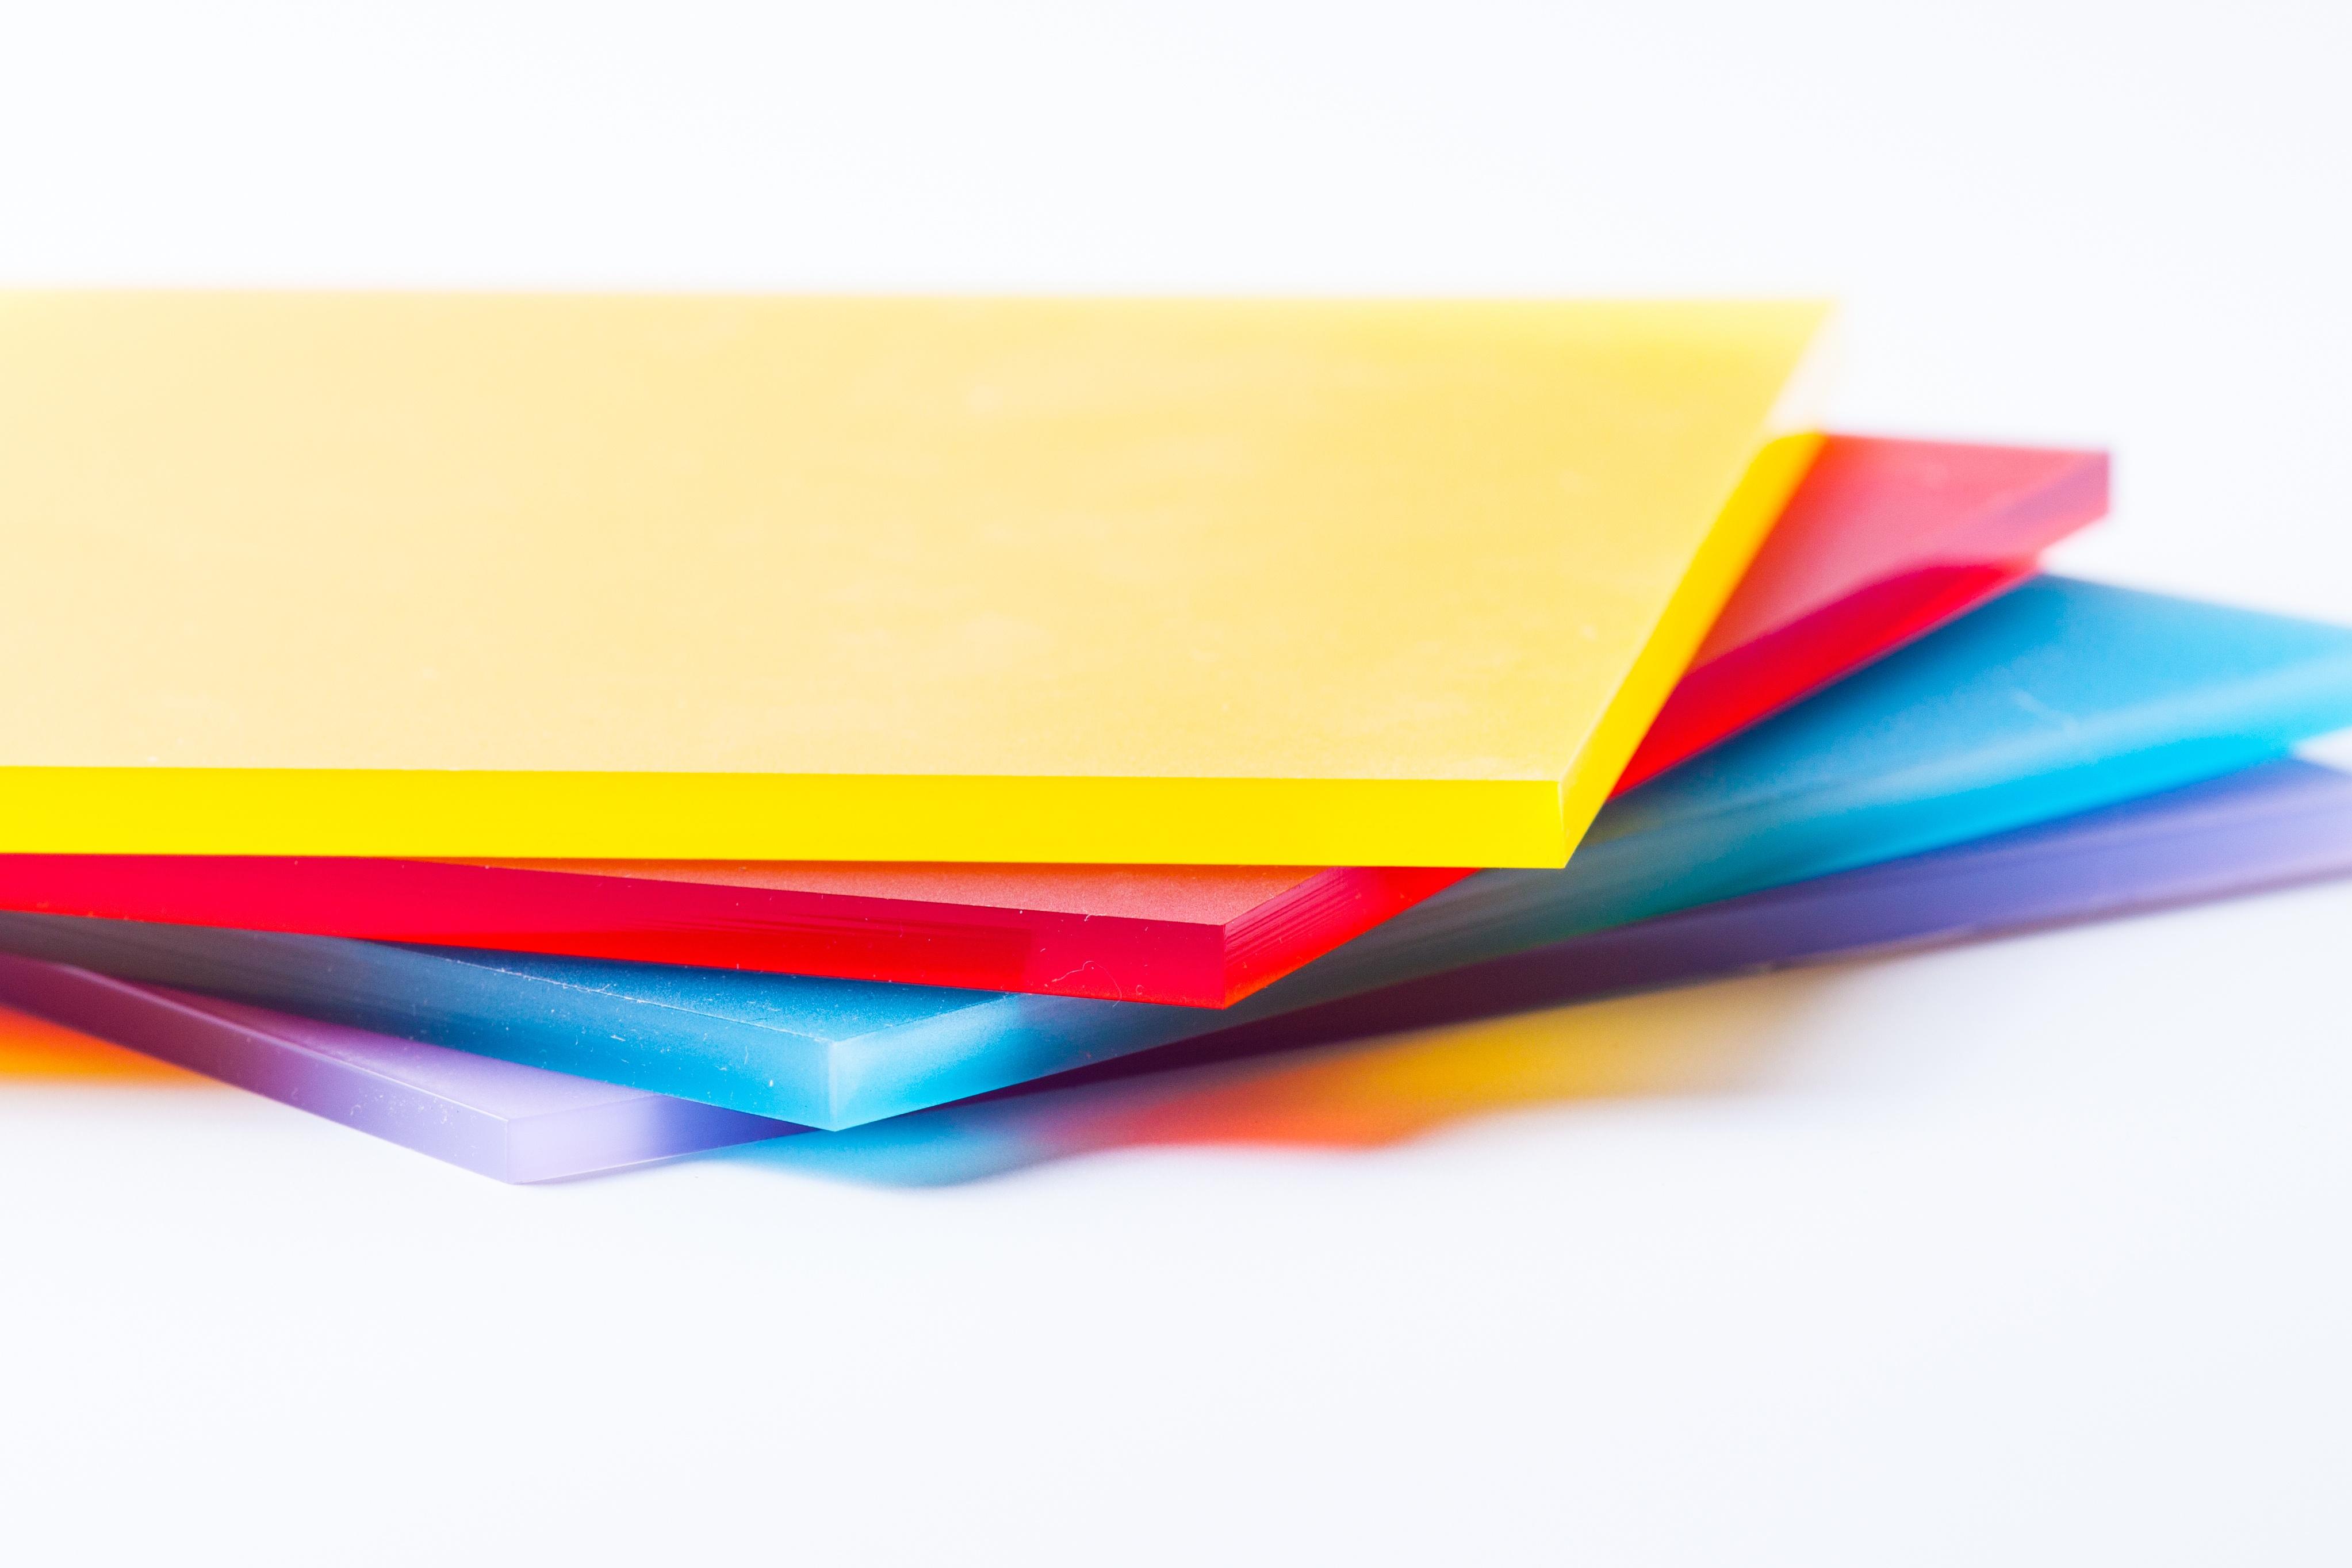 Thick Gauge Plastic Sheet Impact Plastics